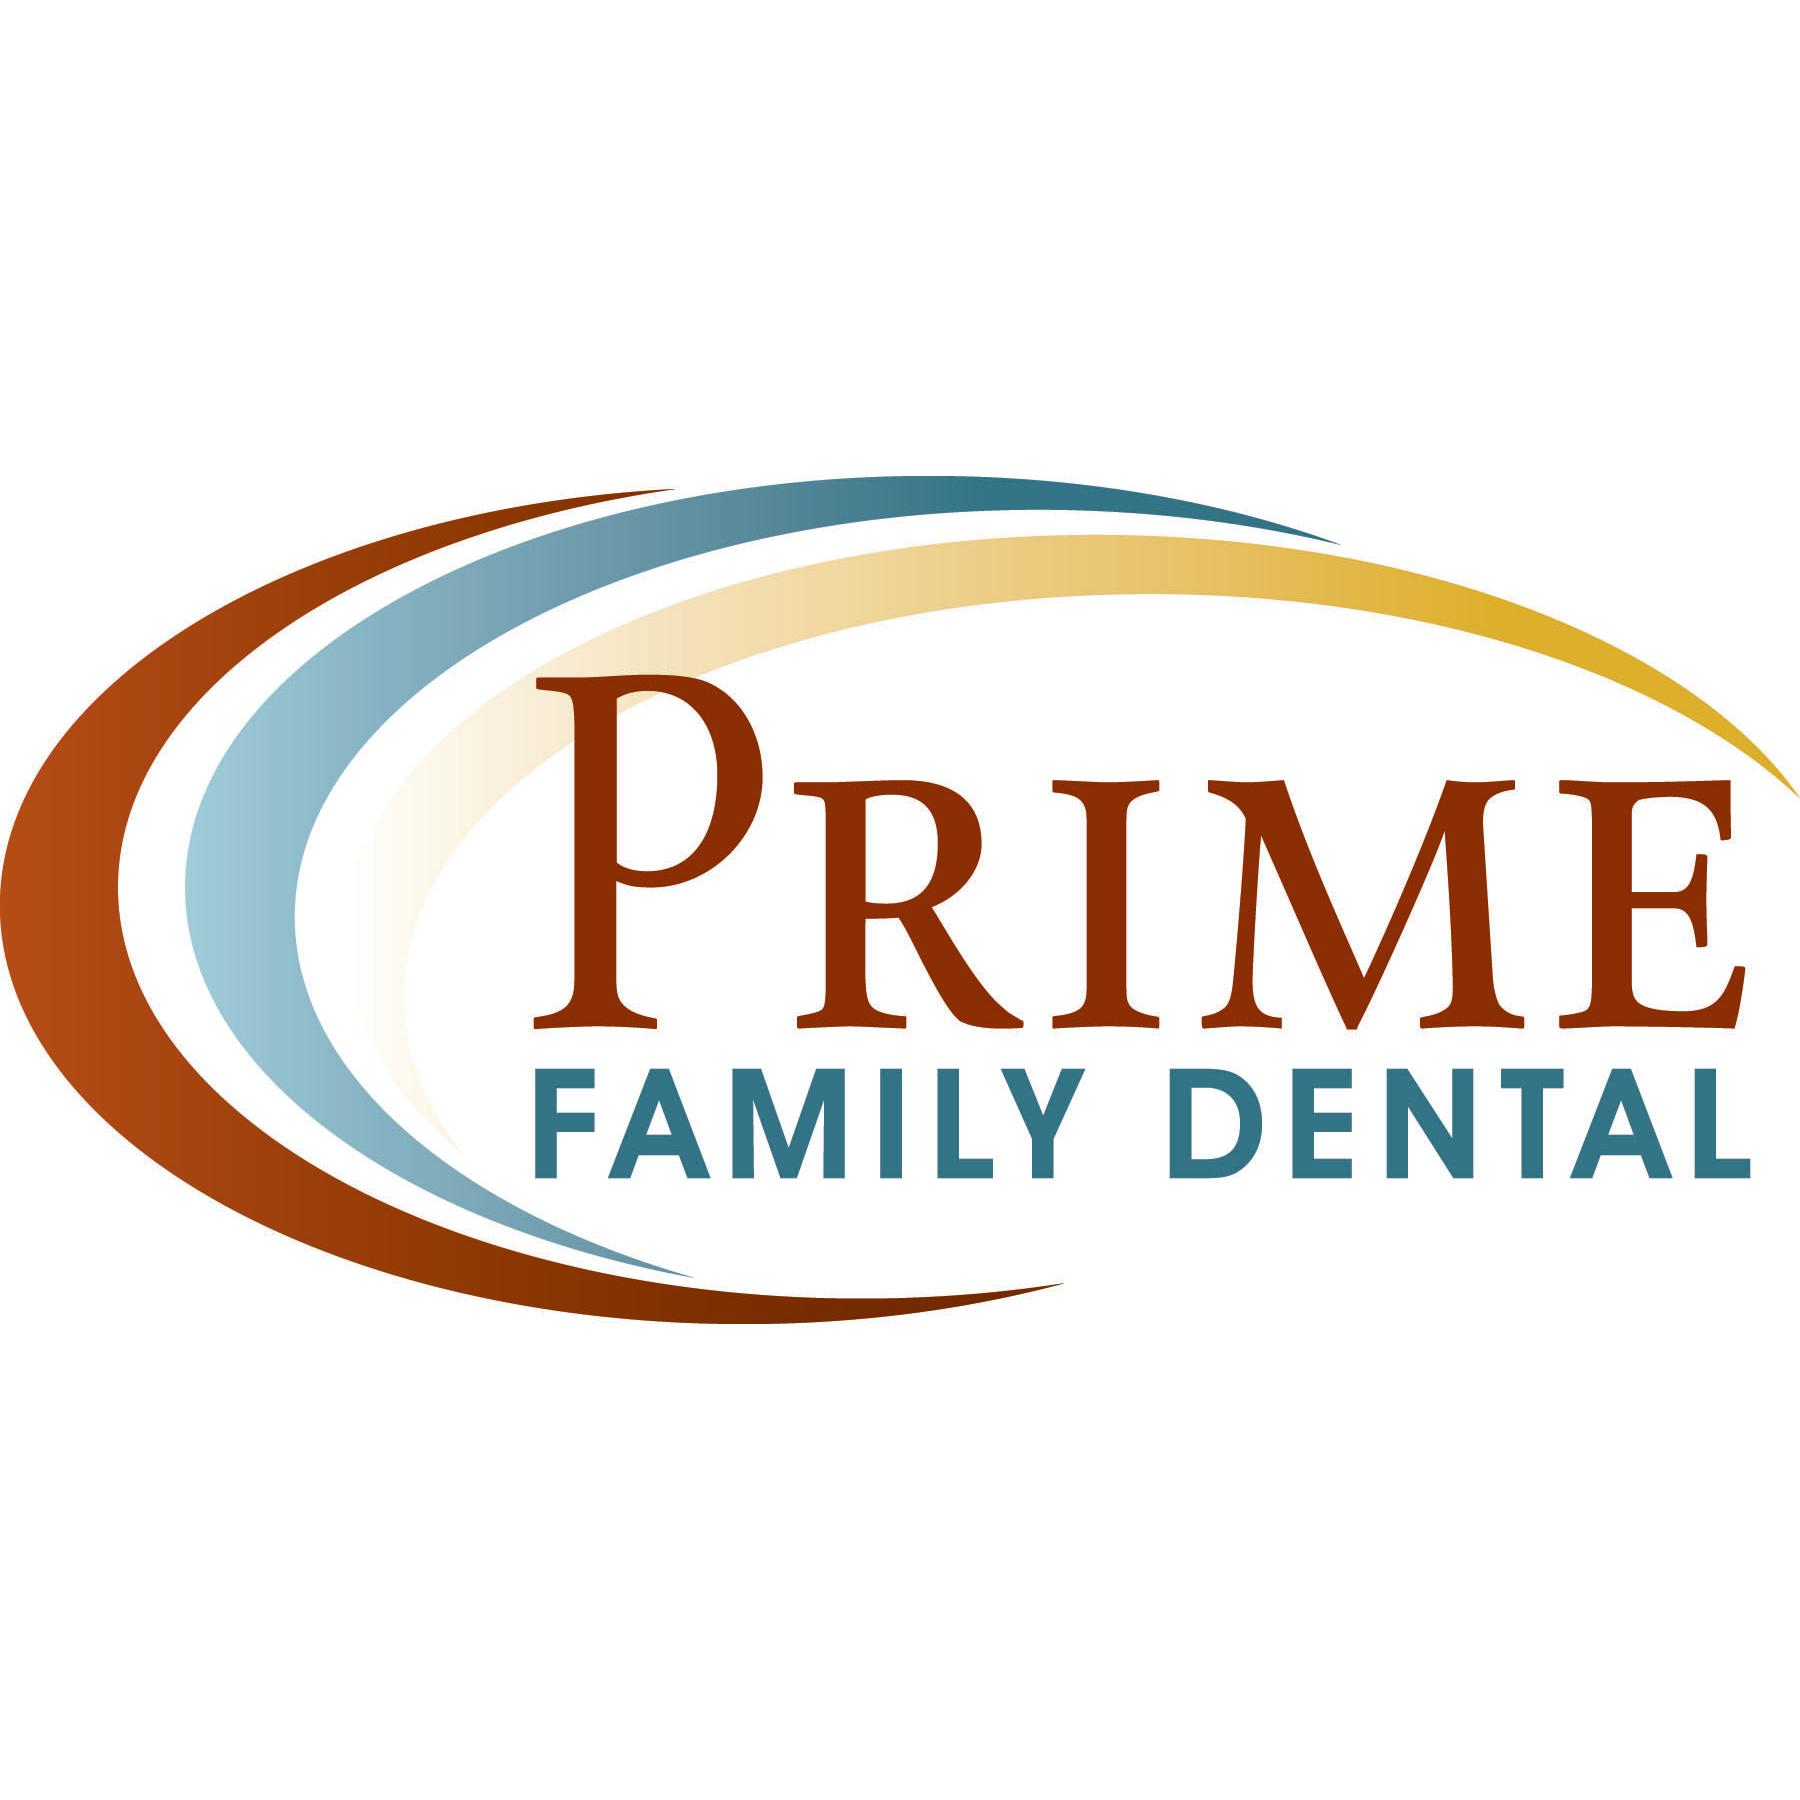 Prime Family Dental